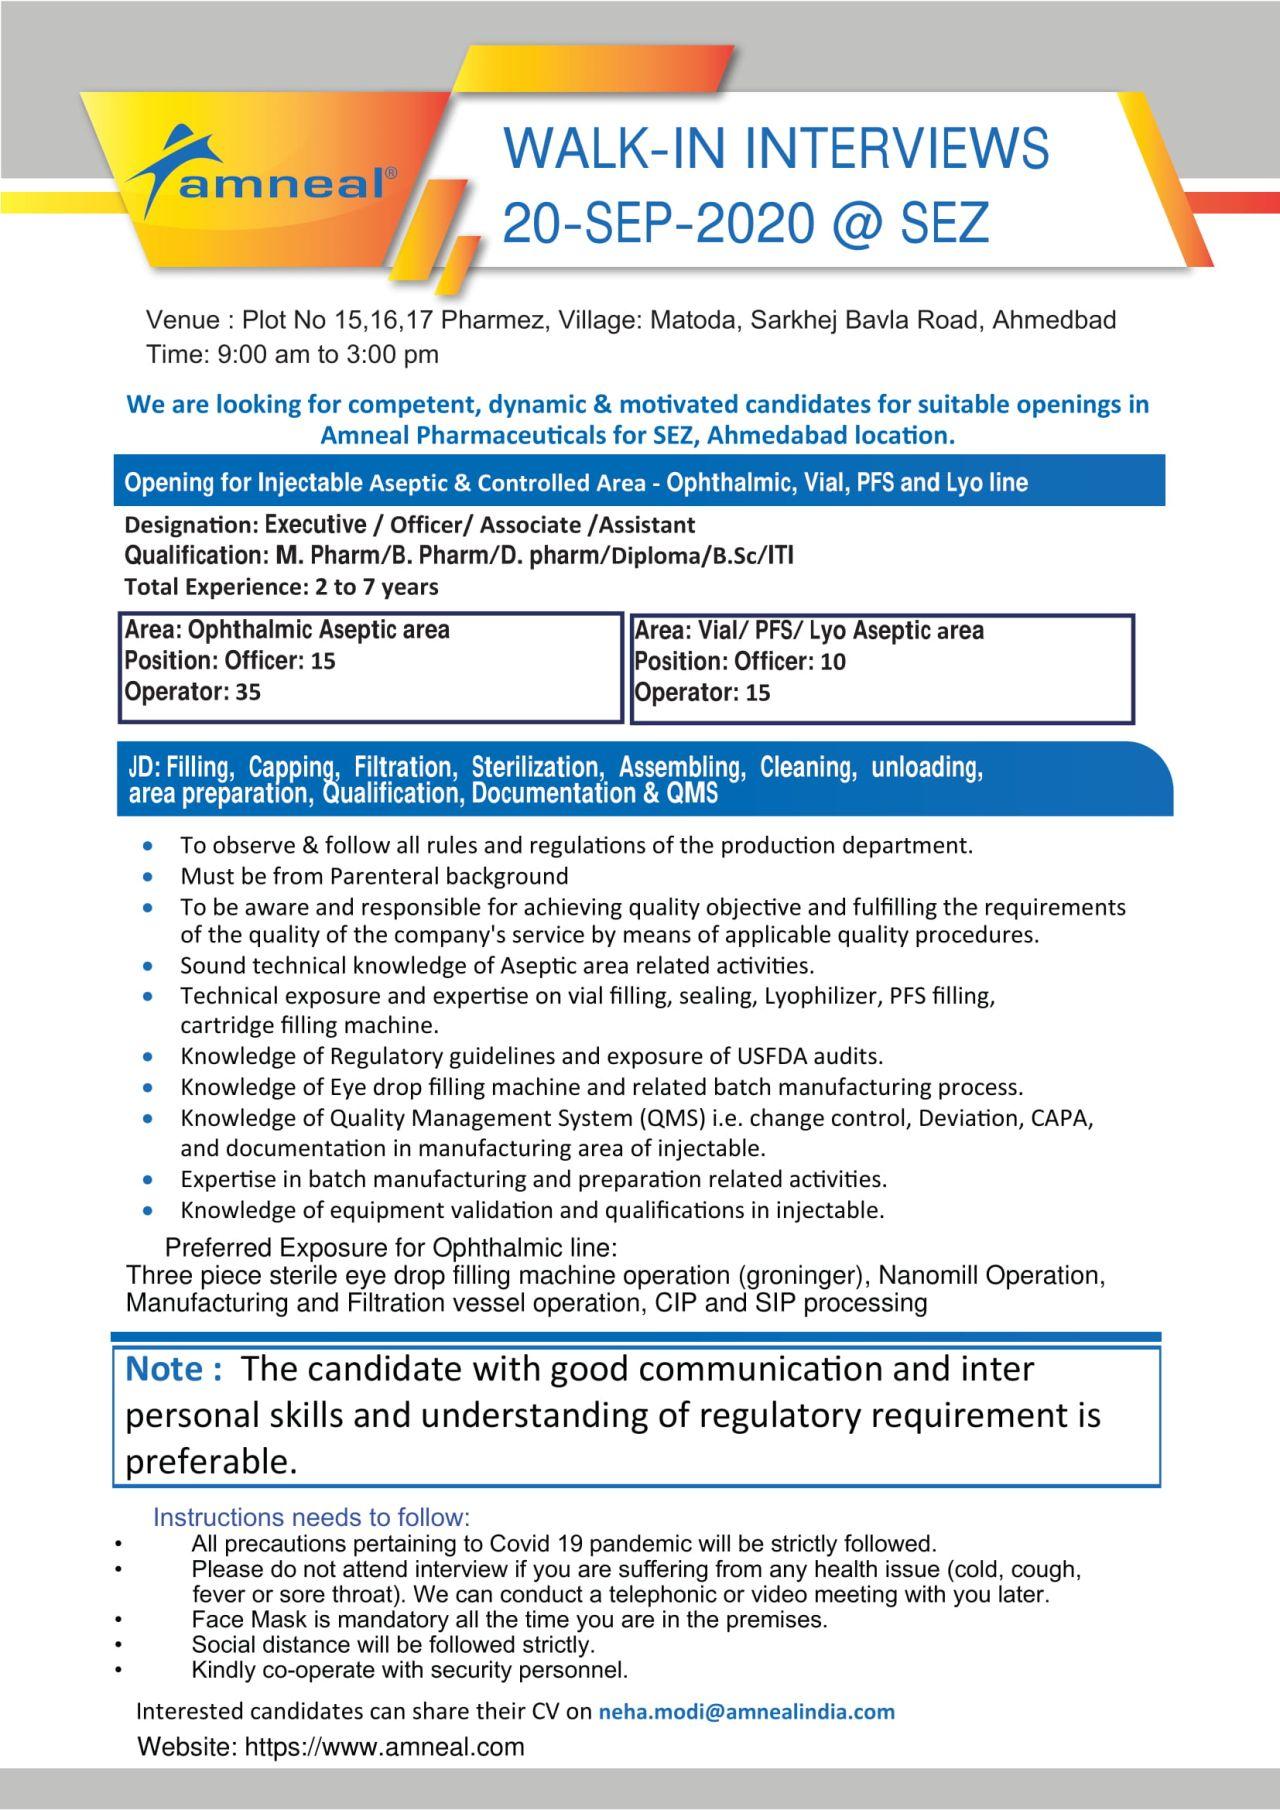 Diploma/  ITI/ B.Sc/D. Pharm/M. Pharm/ B.Pharm/ Jobs Walk-in Interviews In Amneal Pharma Company Matoda, Ahmedabad, Gujarat